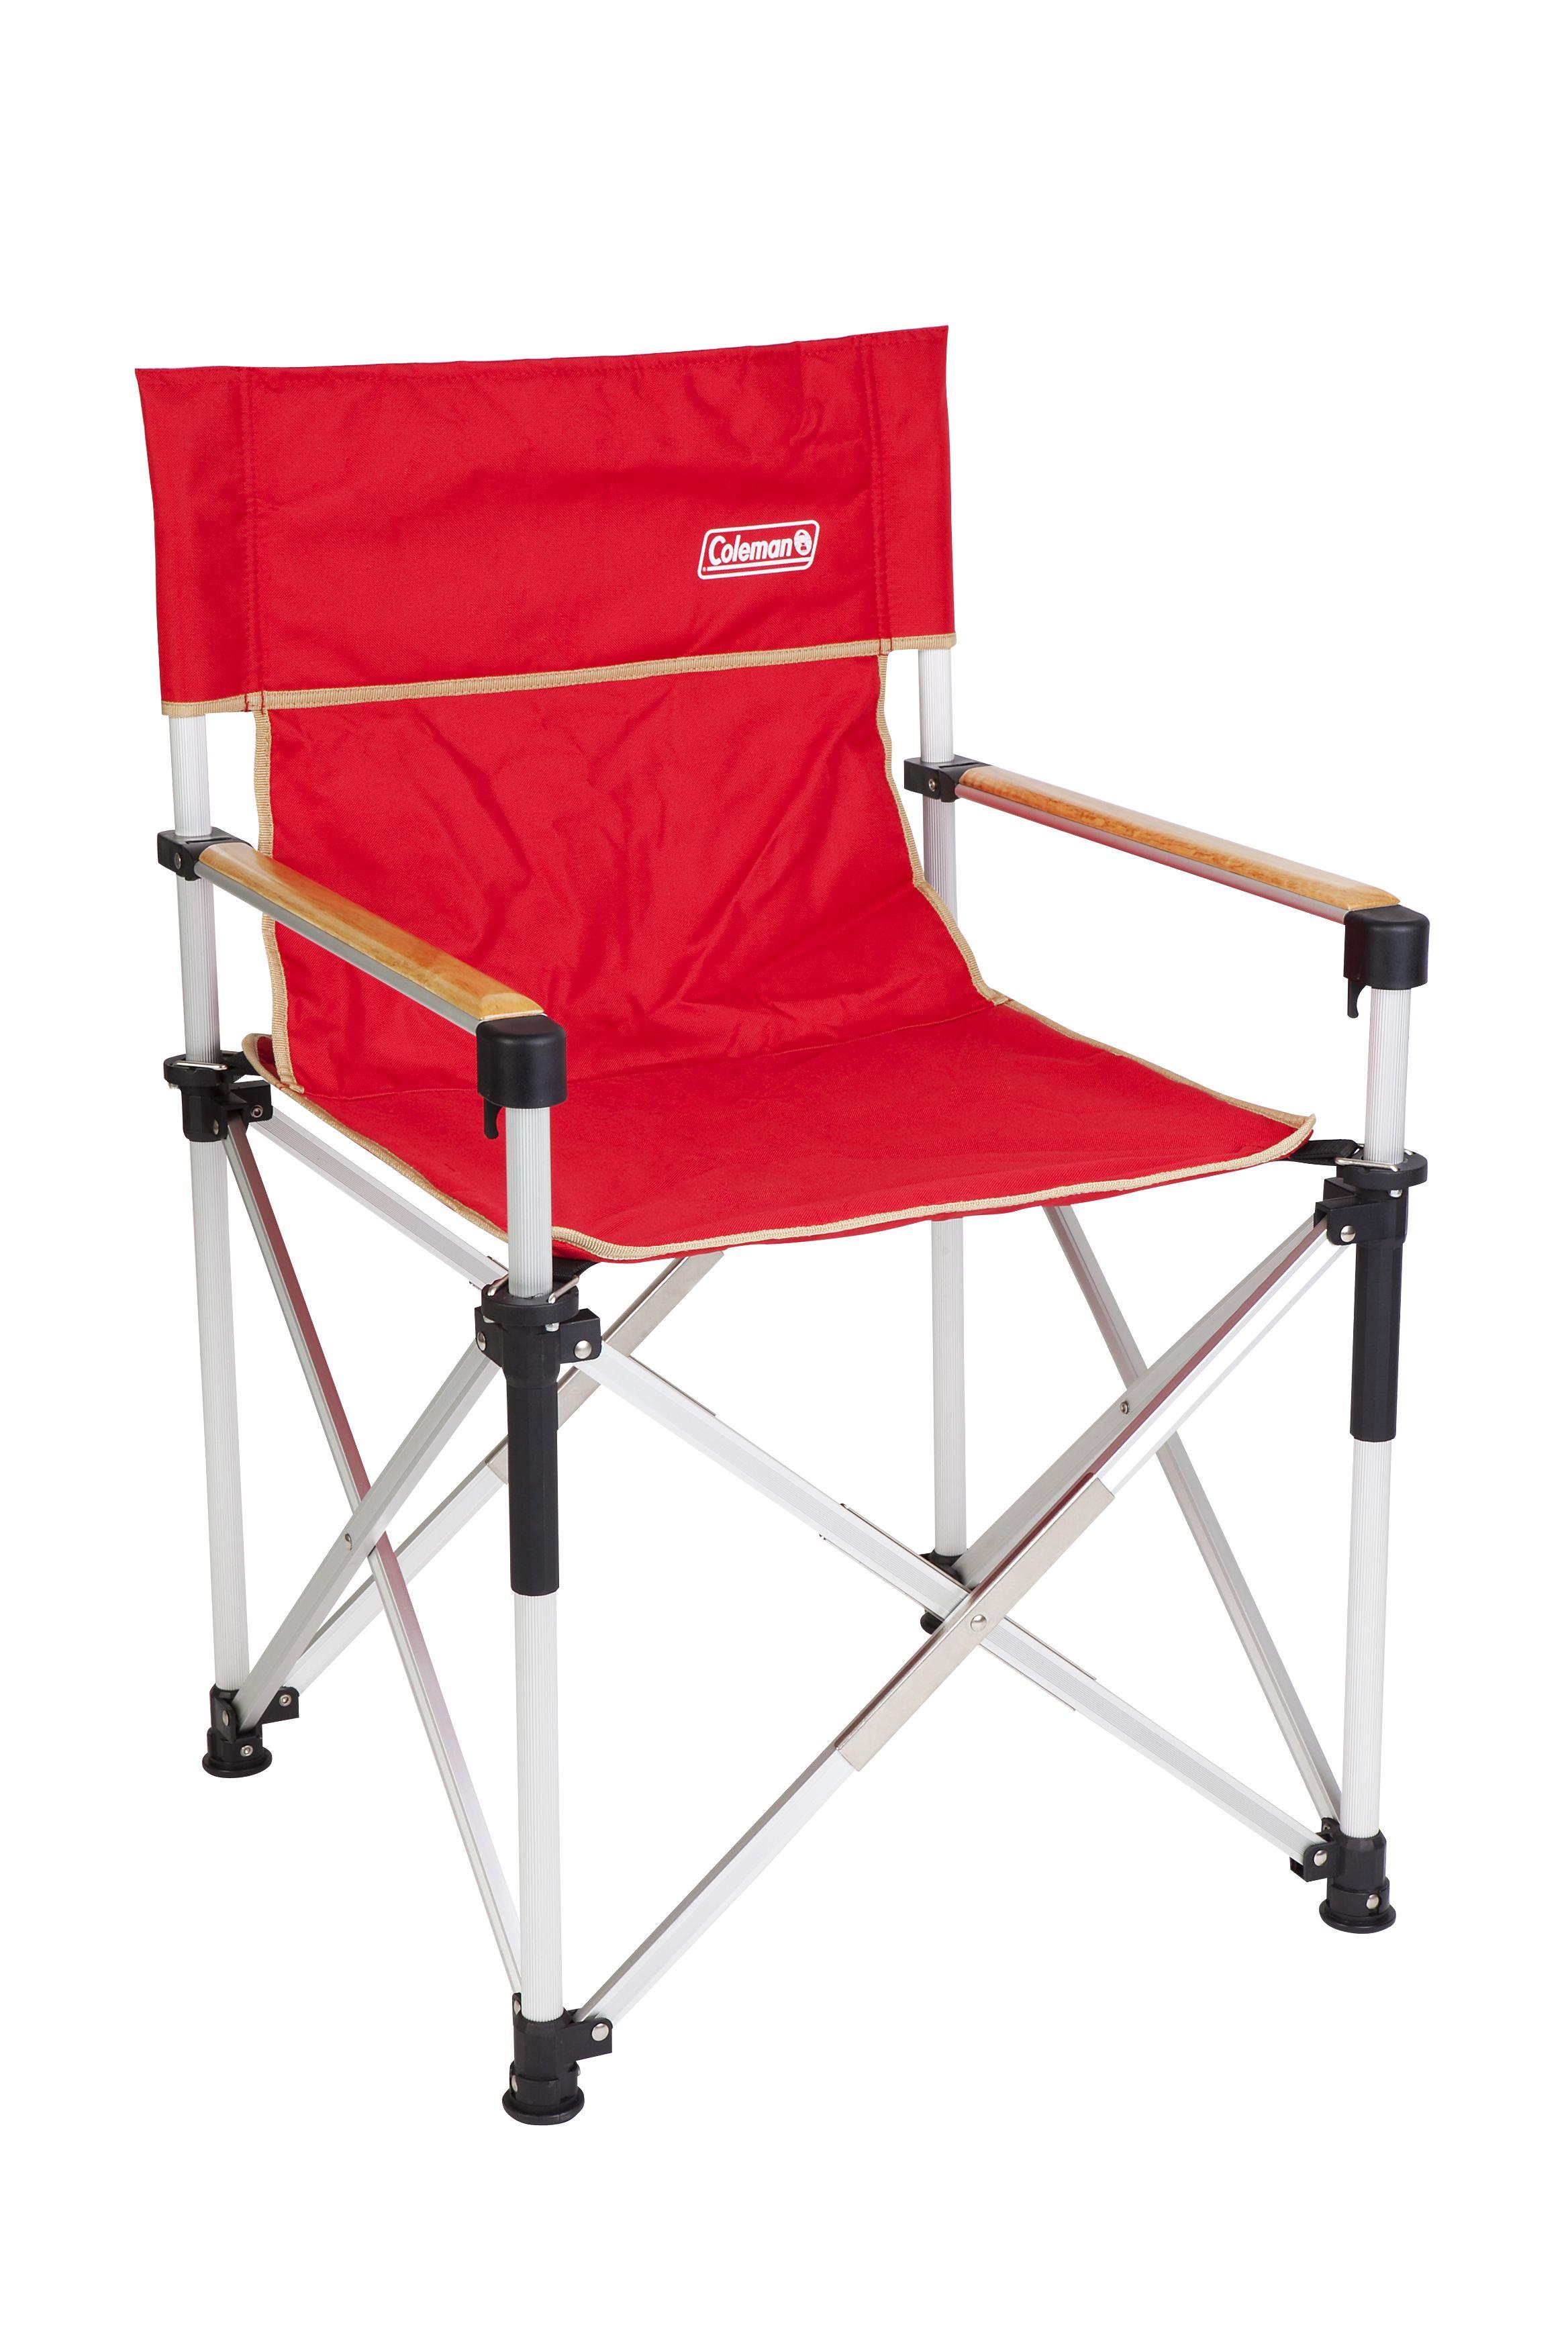 Raa Shop Outdoor Amp Camping Gear